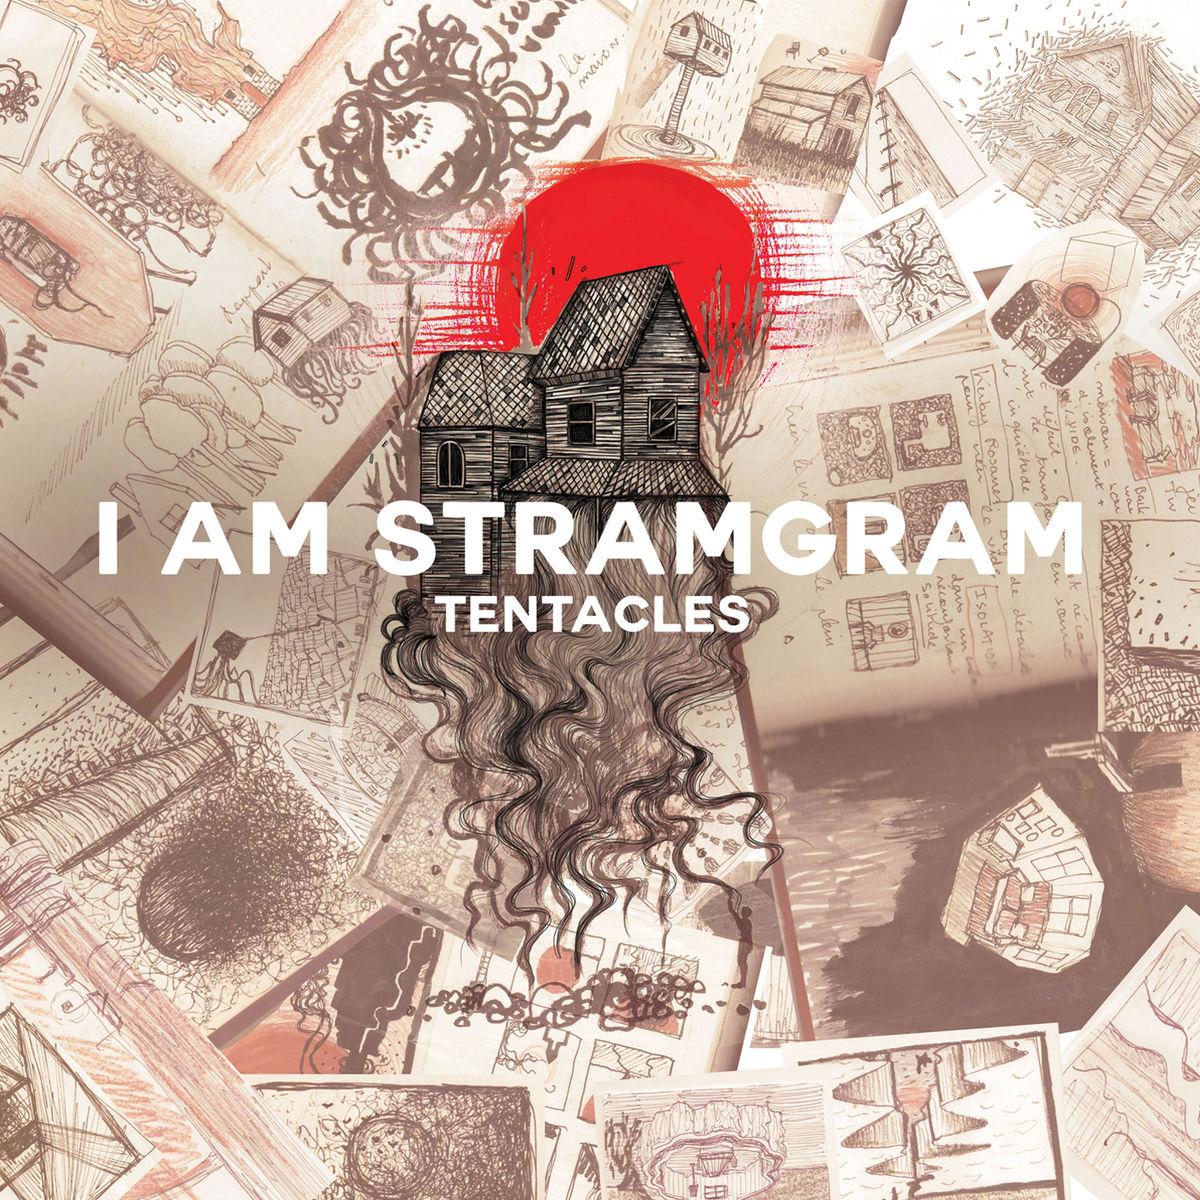 I Am Stramgram - Tentacles